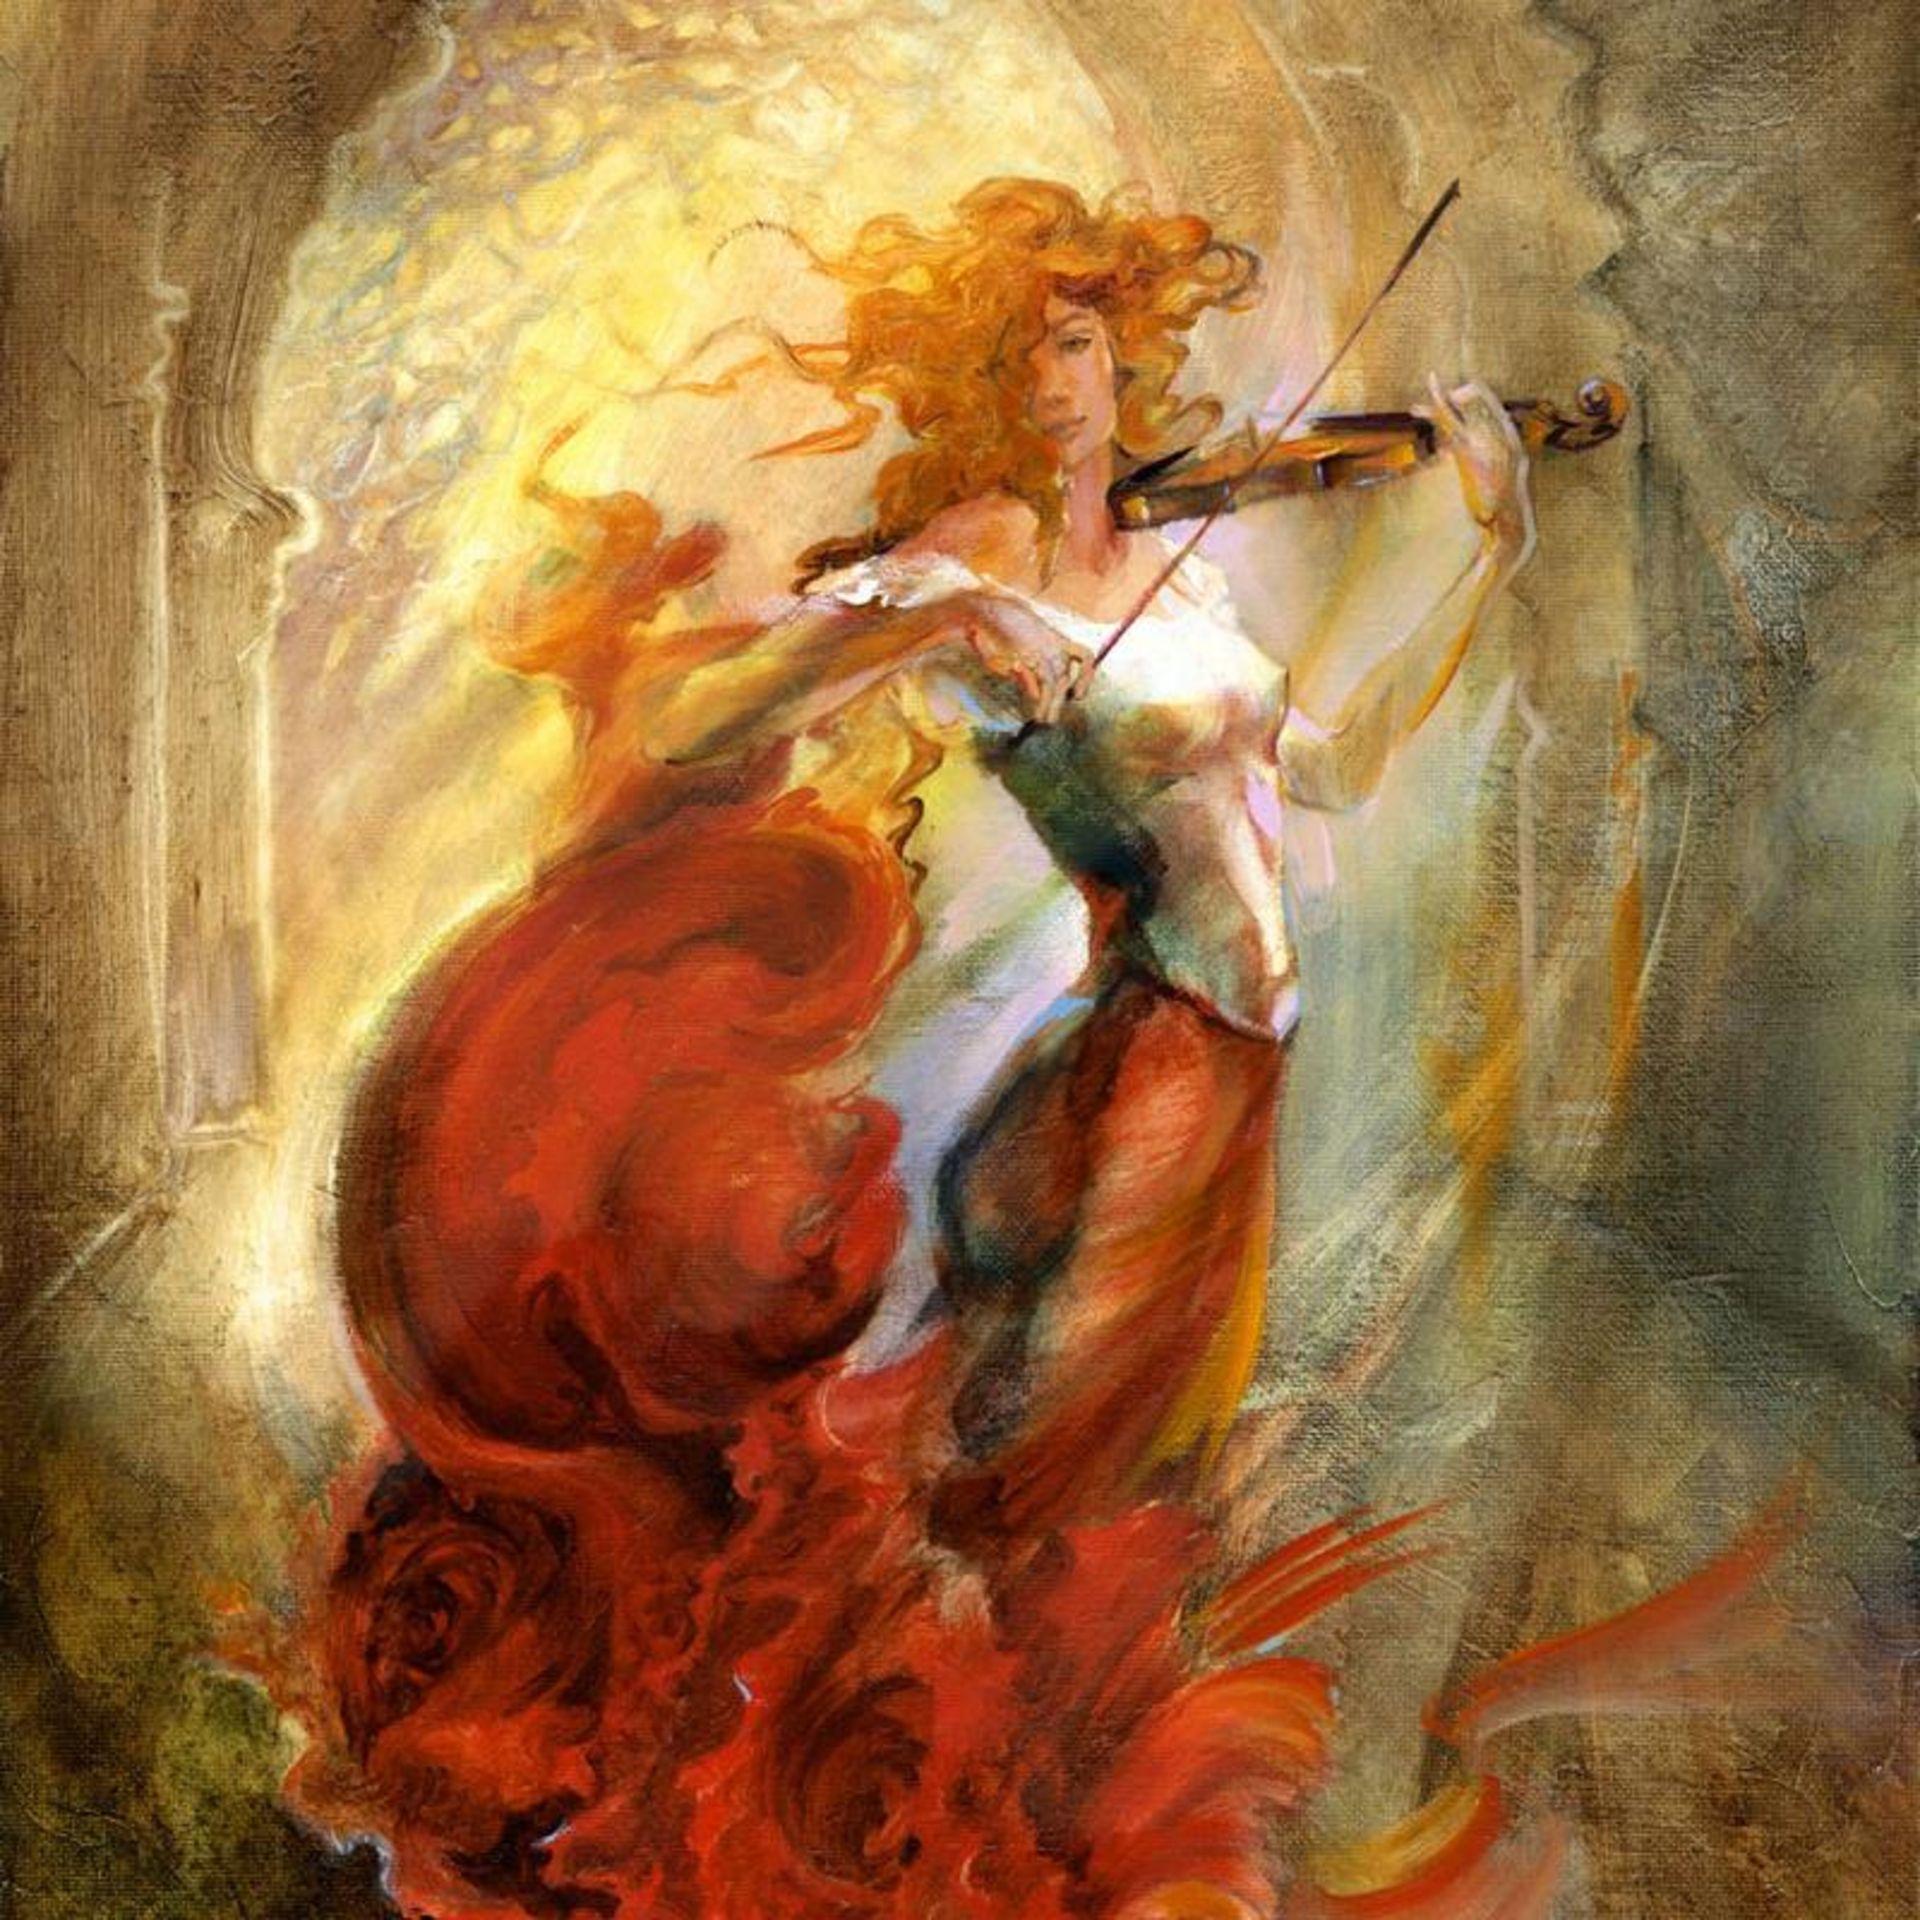 Firebird by Sotskova, Lena - Image 2 of 2